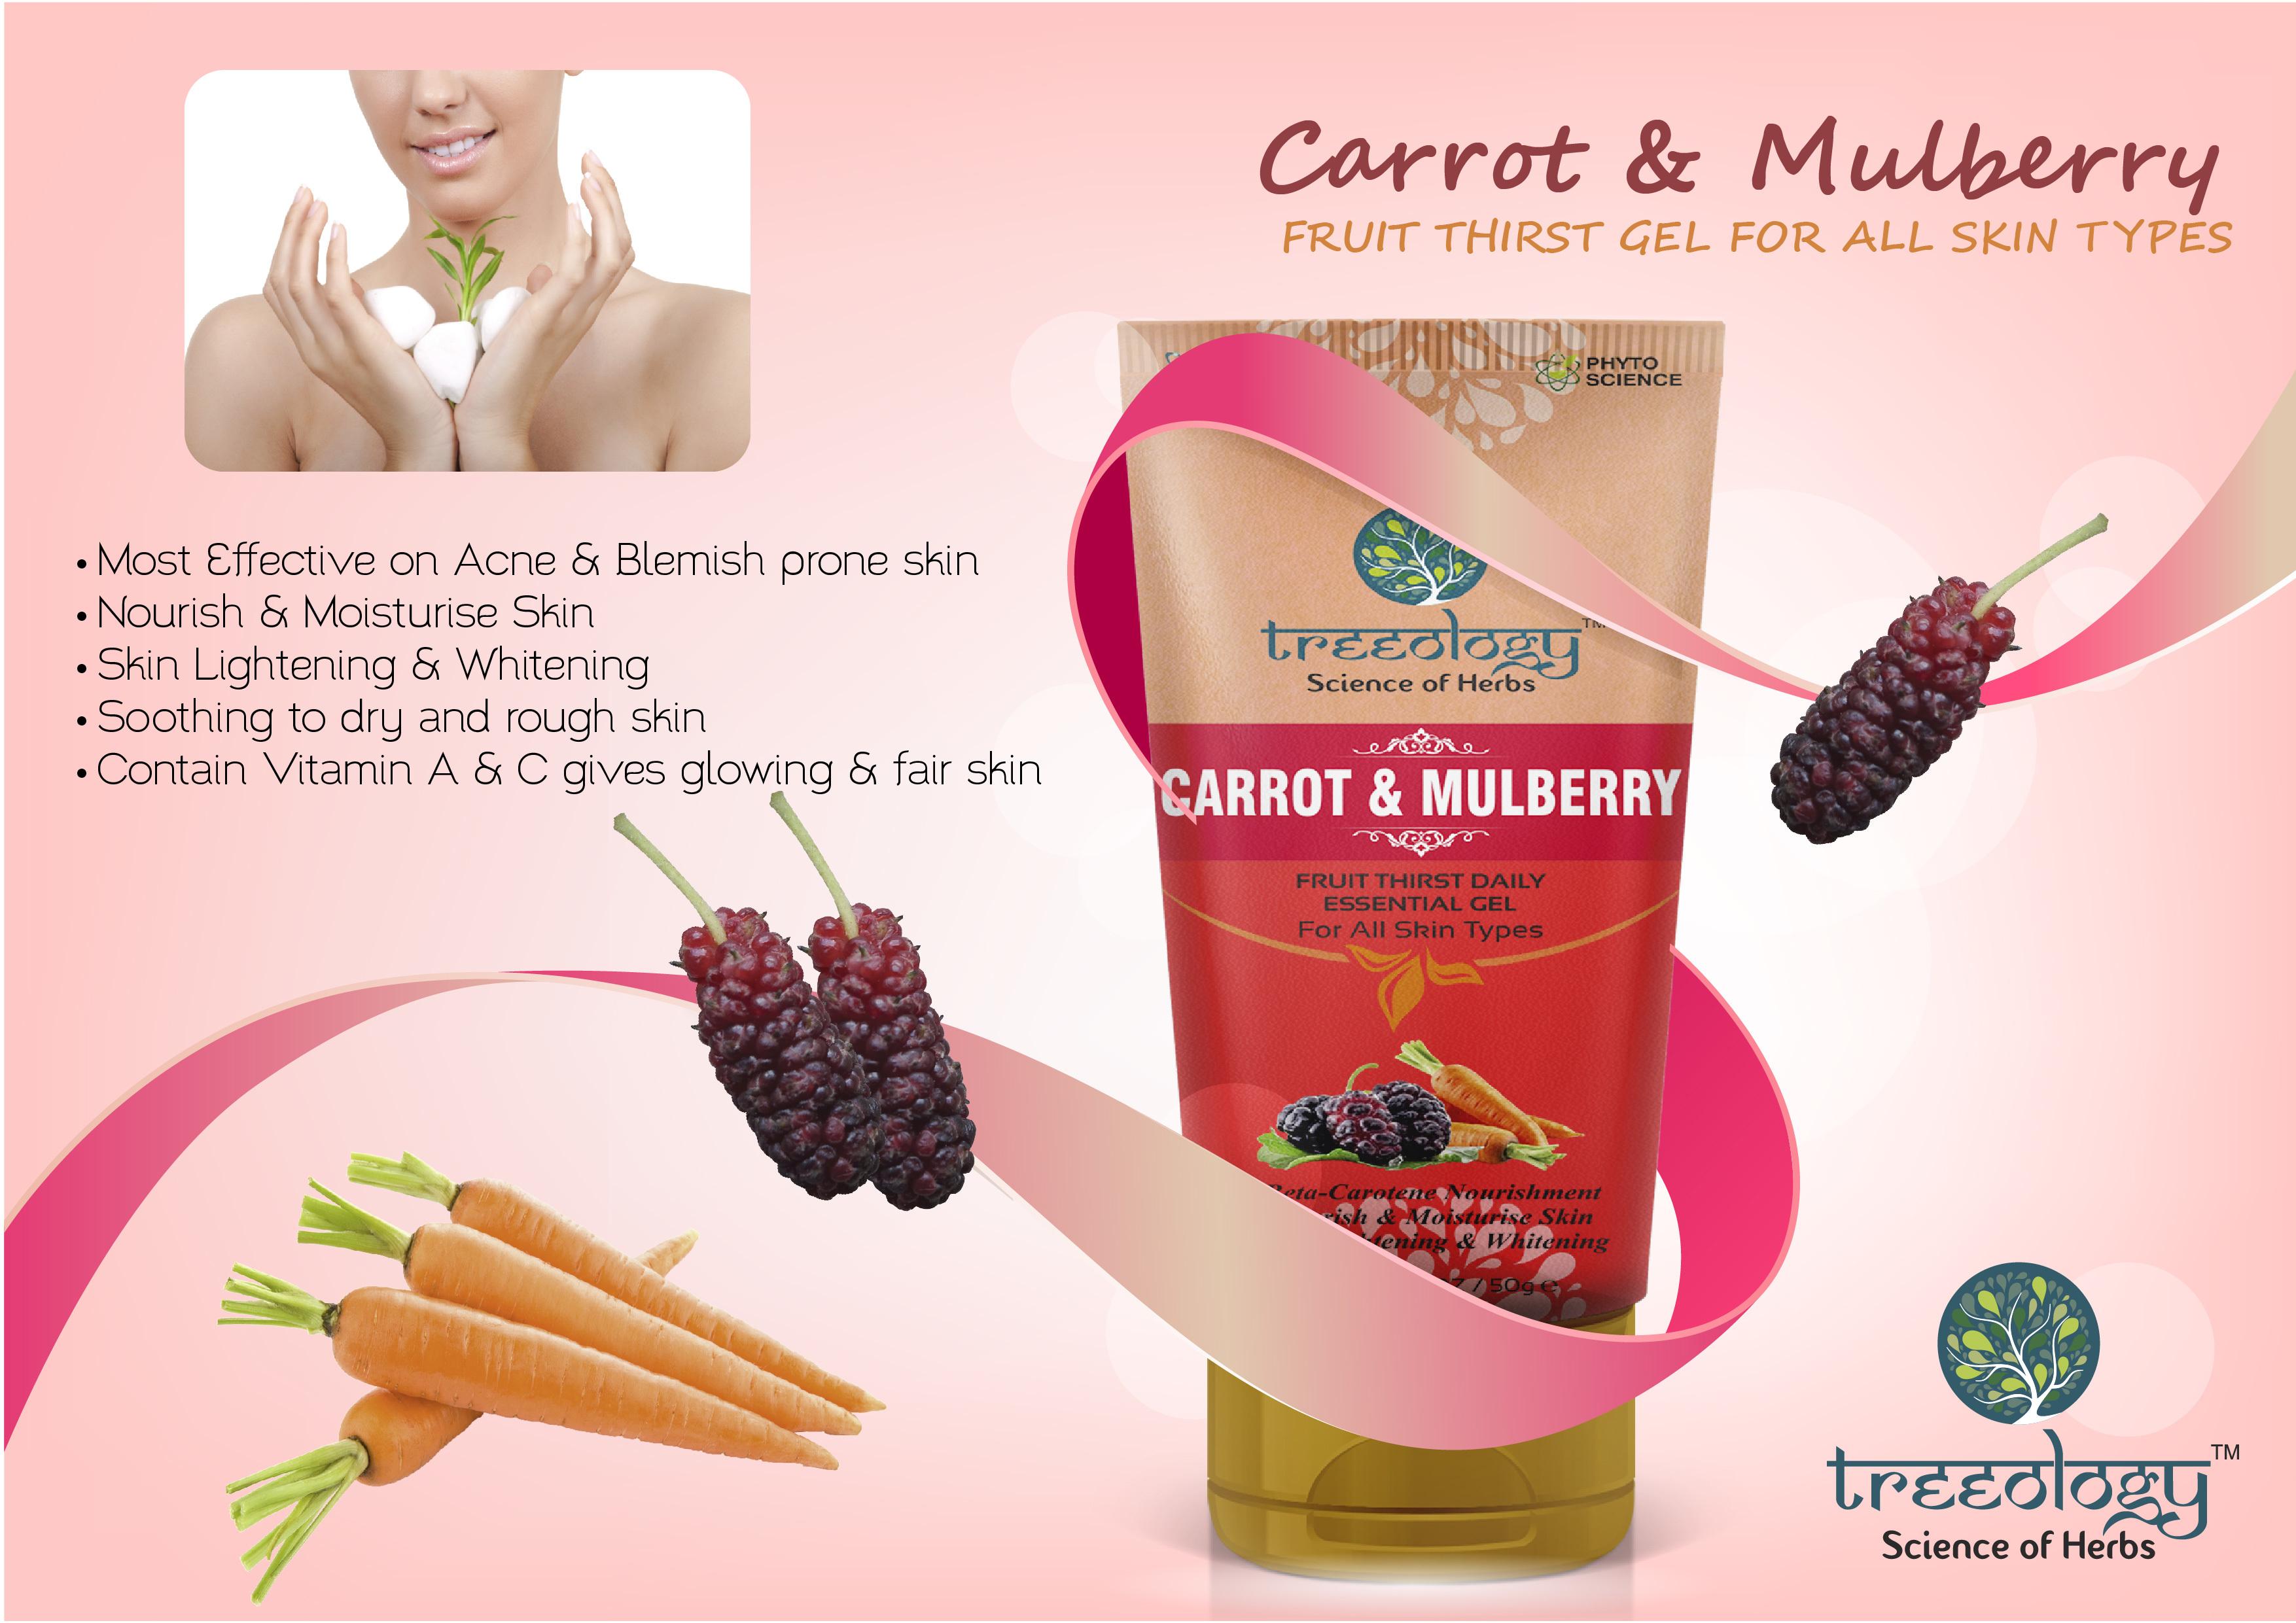 Carrot & Mulbery Fruit Thirst Gel